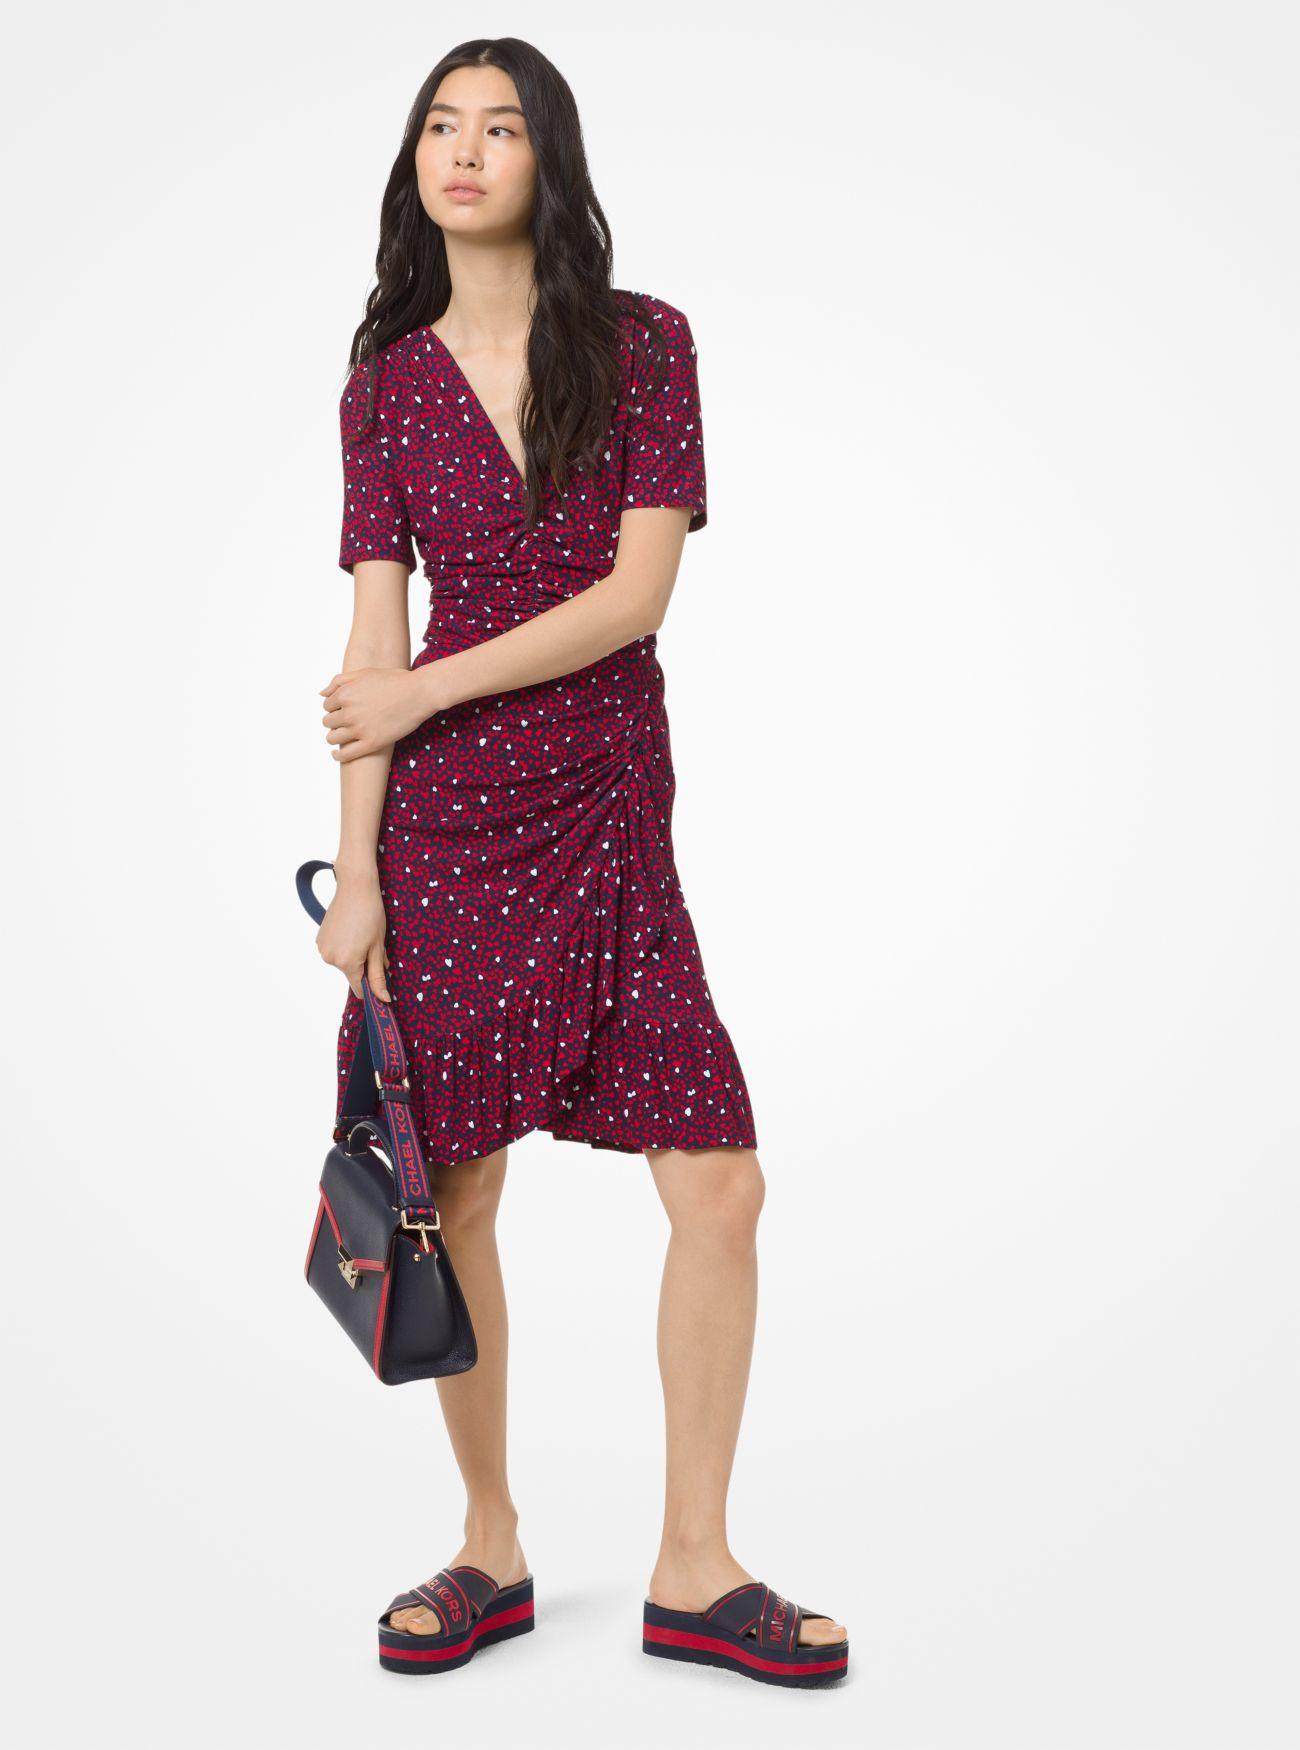 Mini Heart Dress Whitney Satchel Demi Sandal Michael Kors